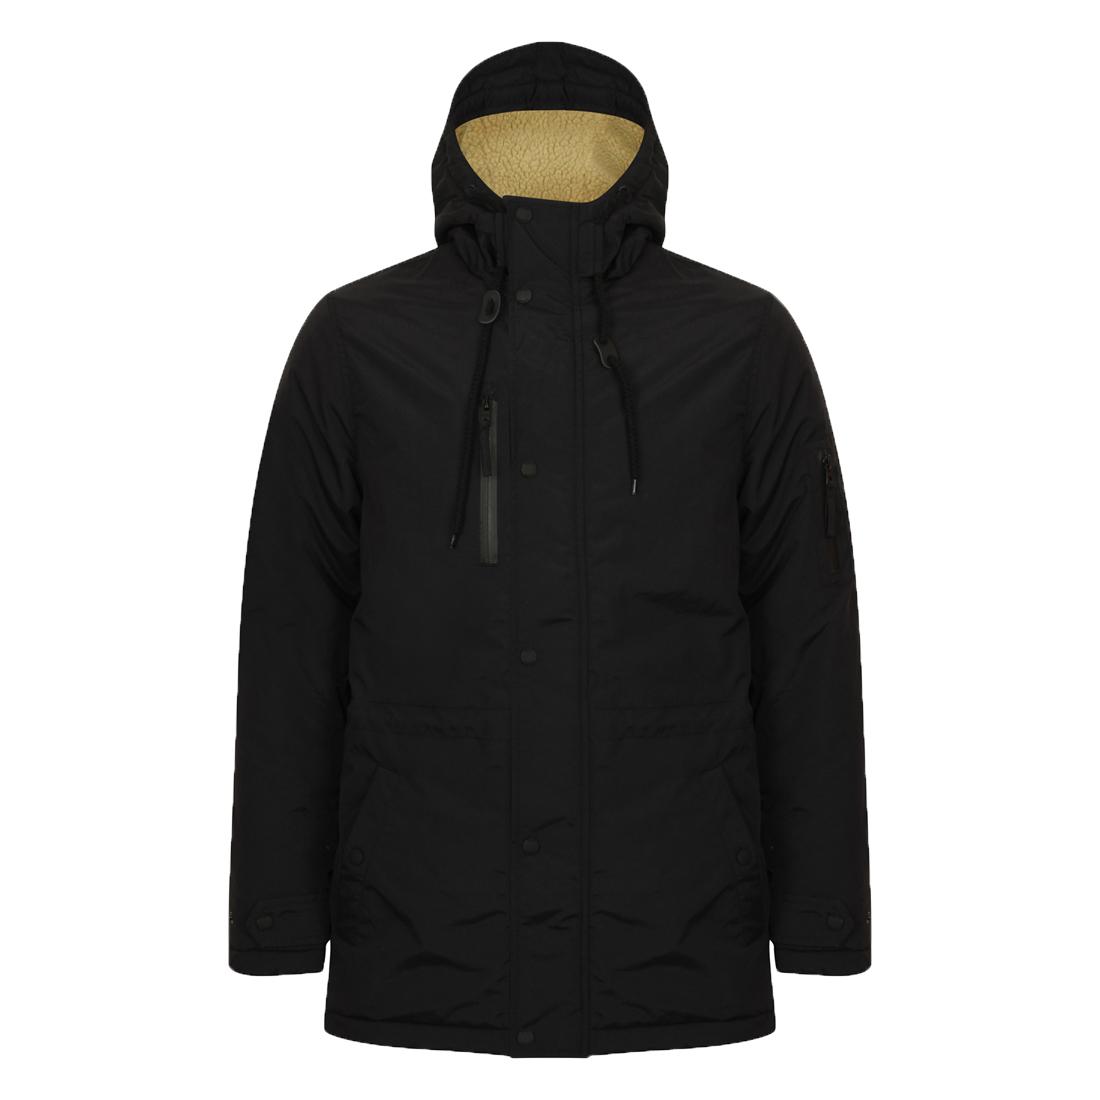 Mens Winter Coat Army Style Fishtail Parka Jacket Mod By Tokyo Laundry